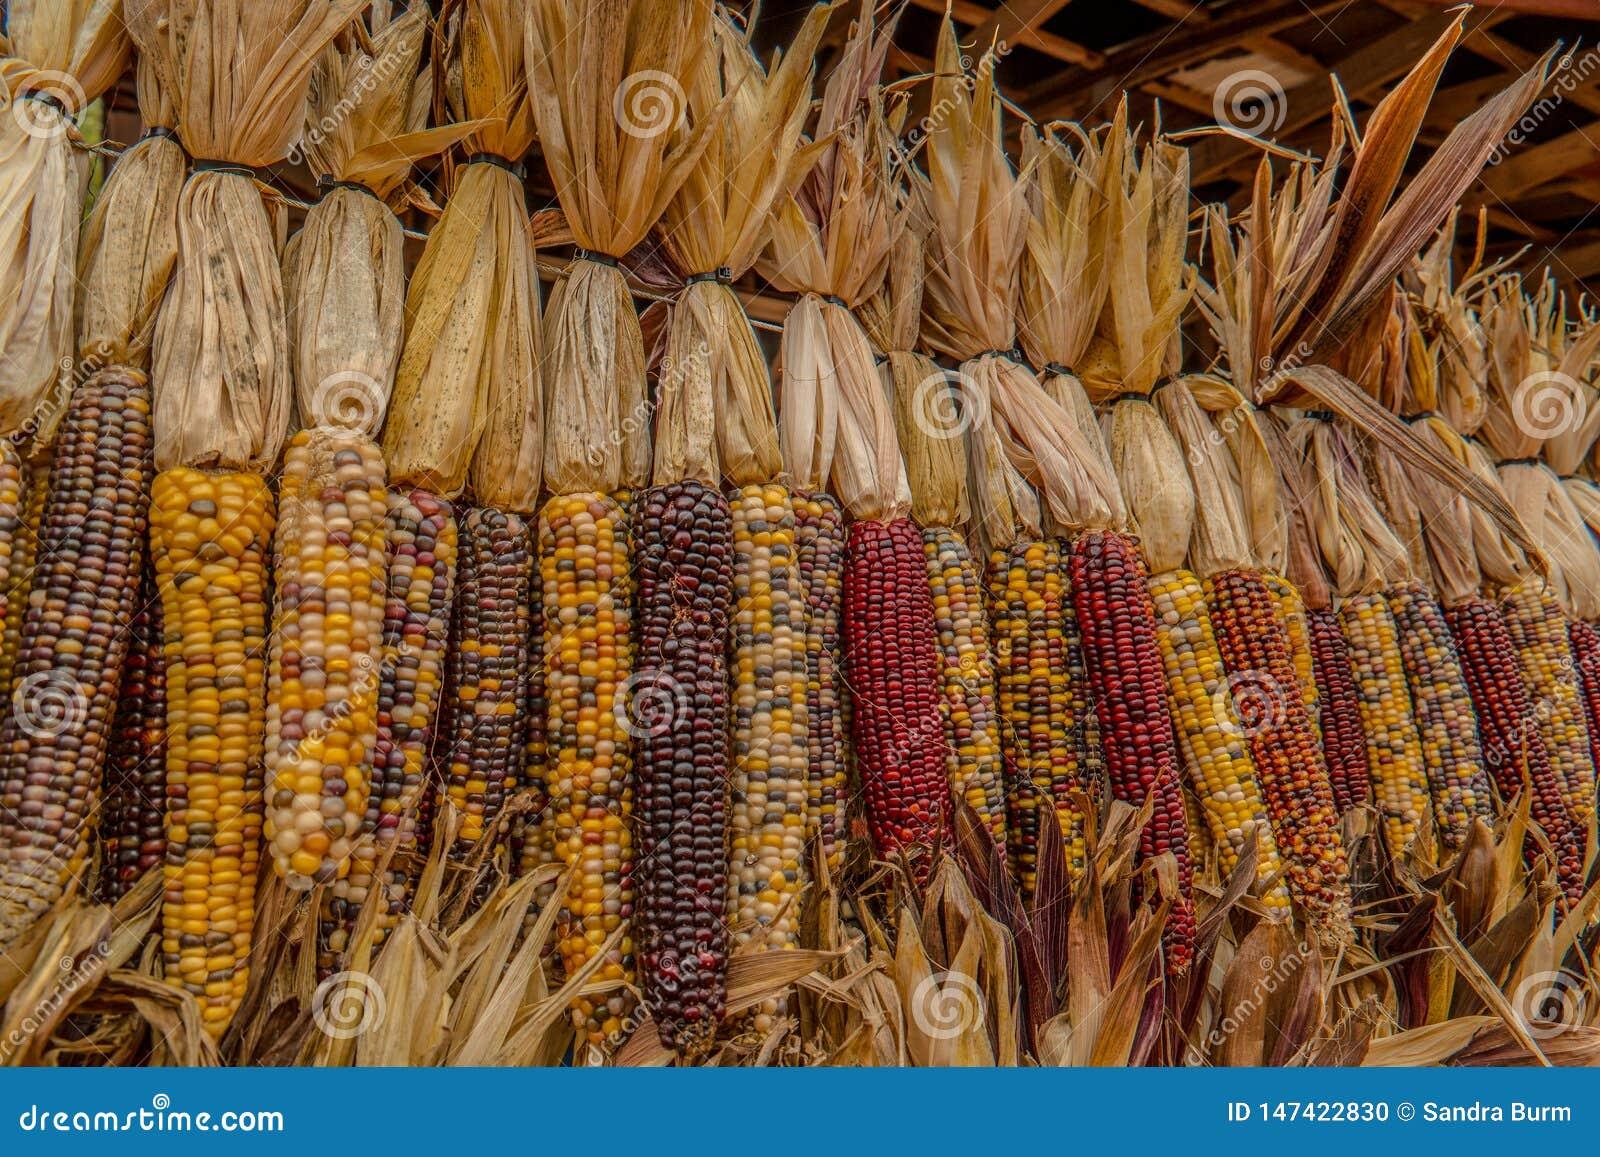 Indian corn in autumn